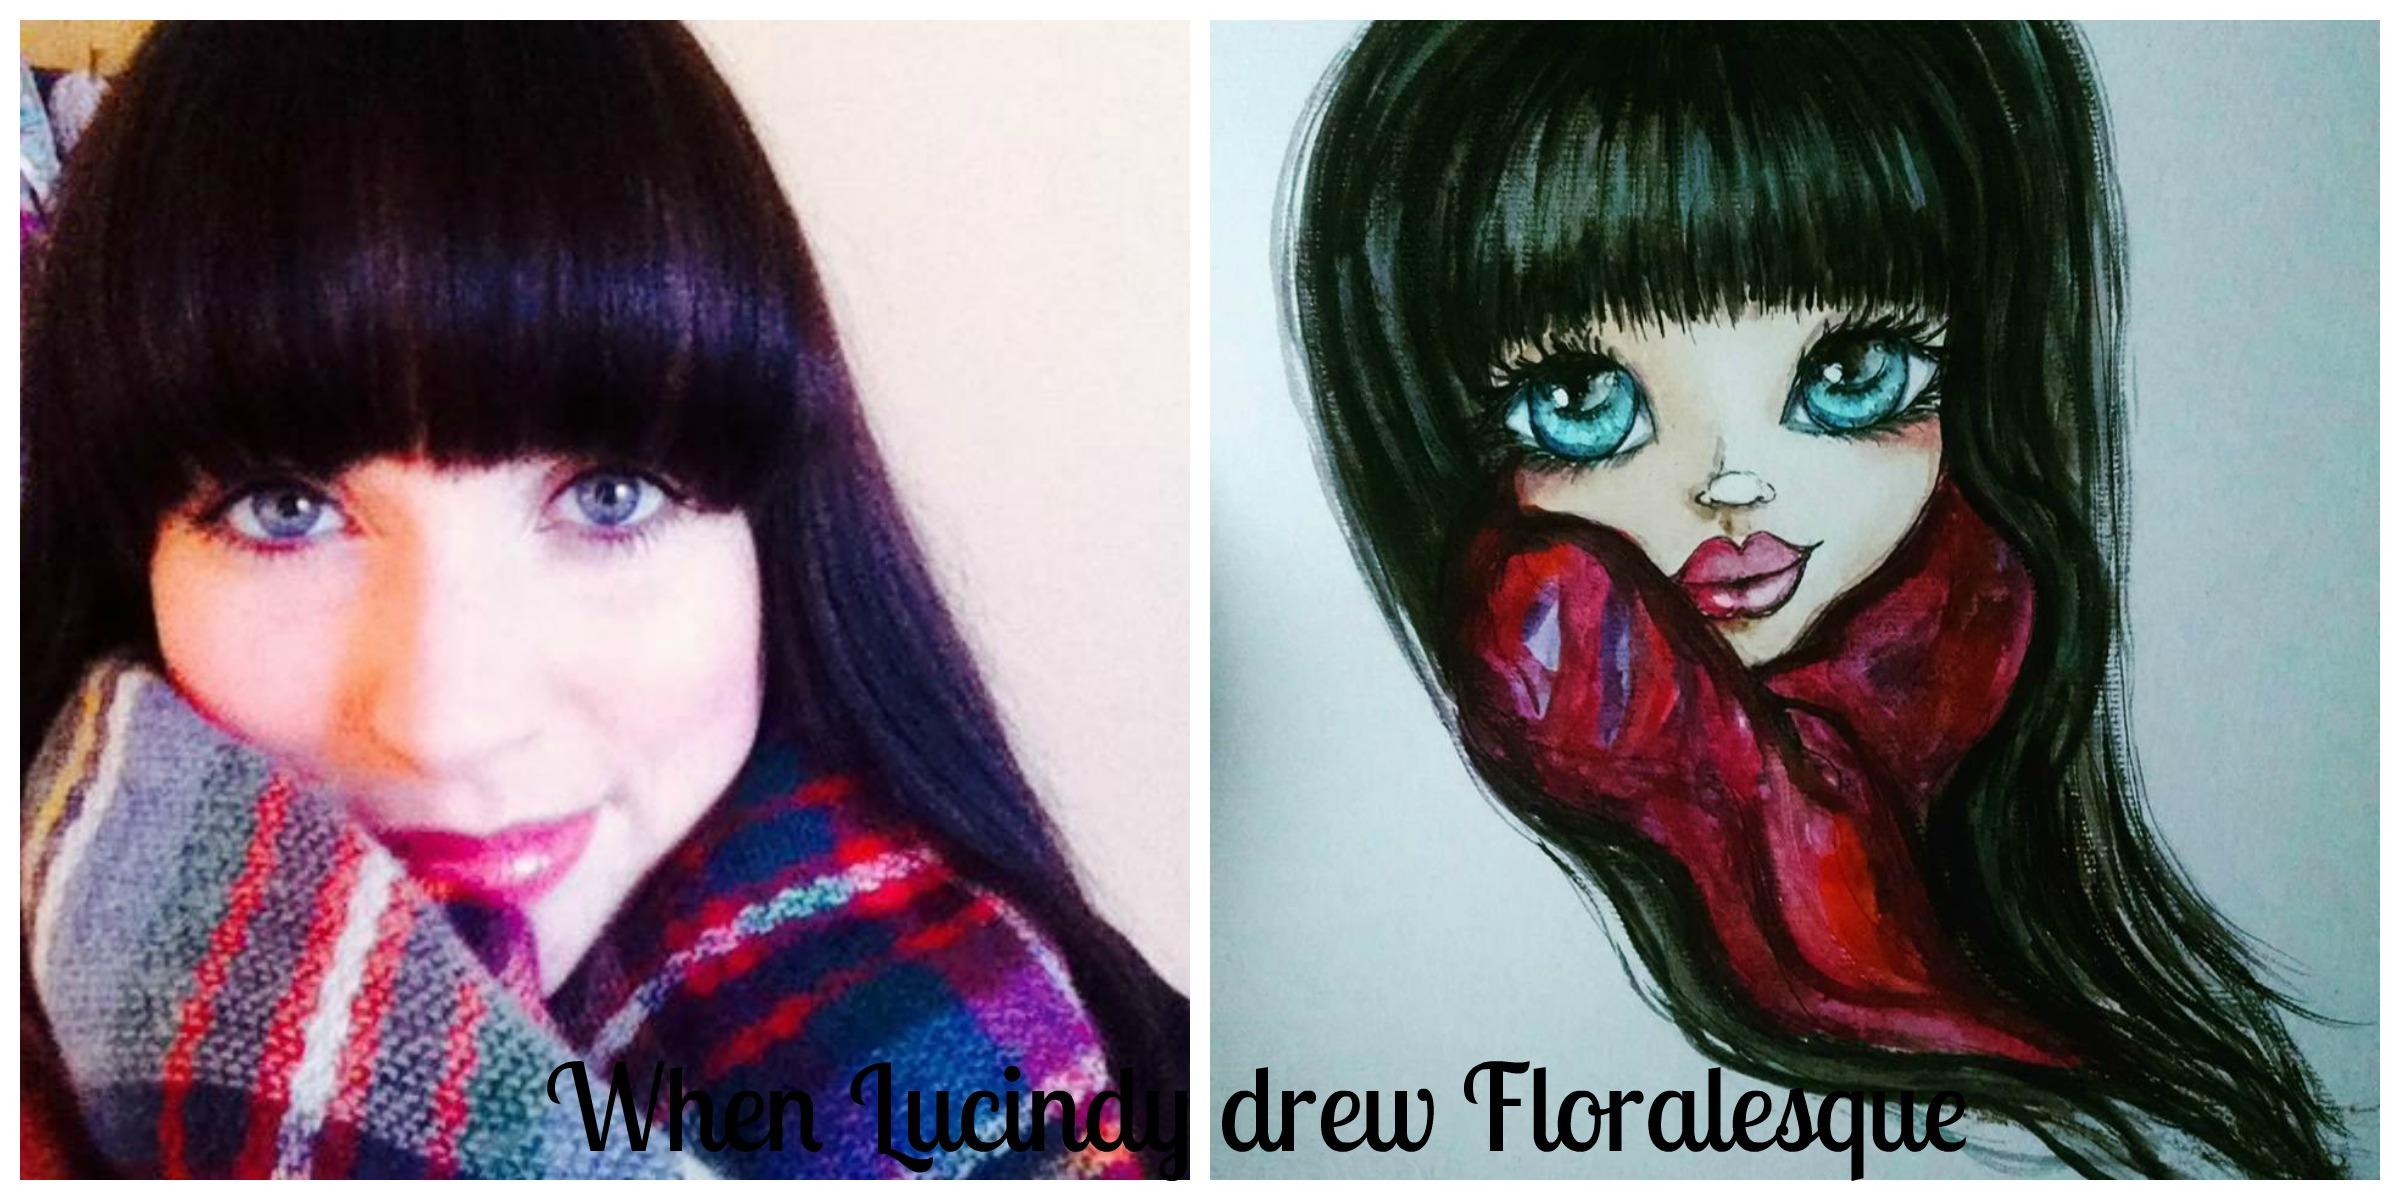 When Lucindy drew Floralesque